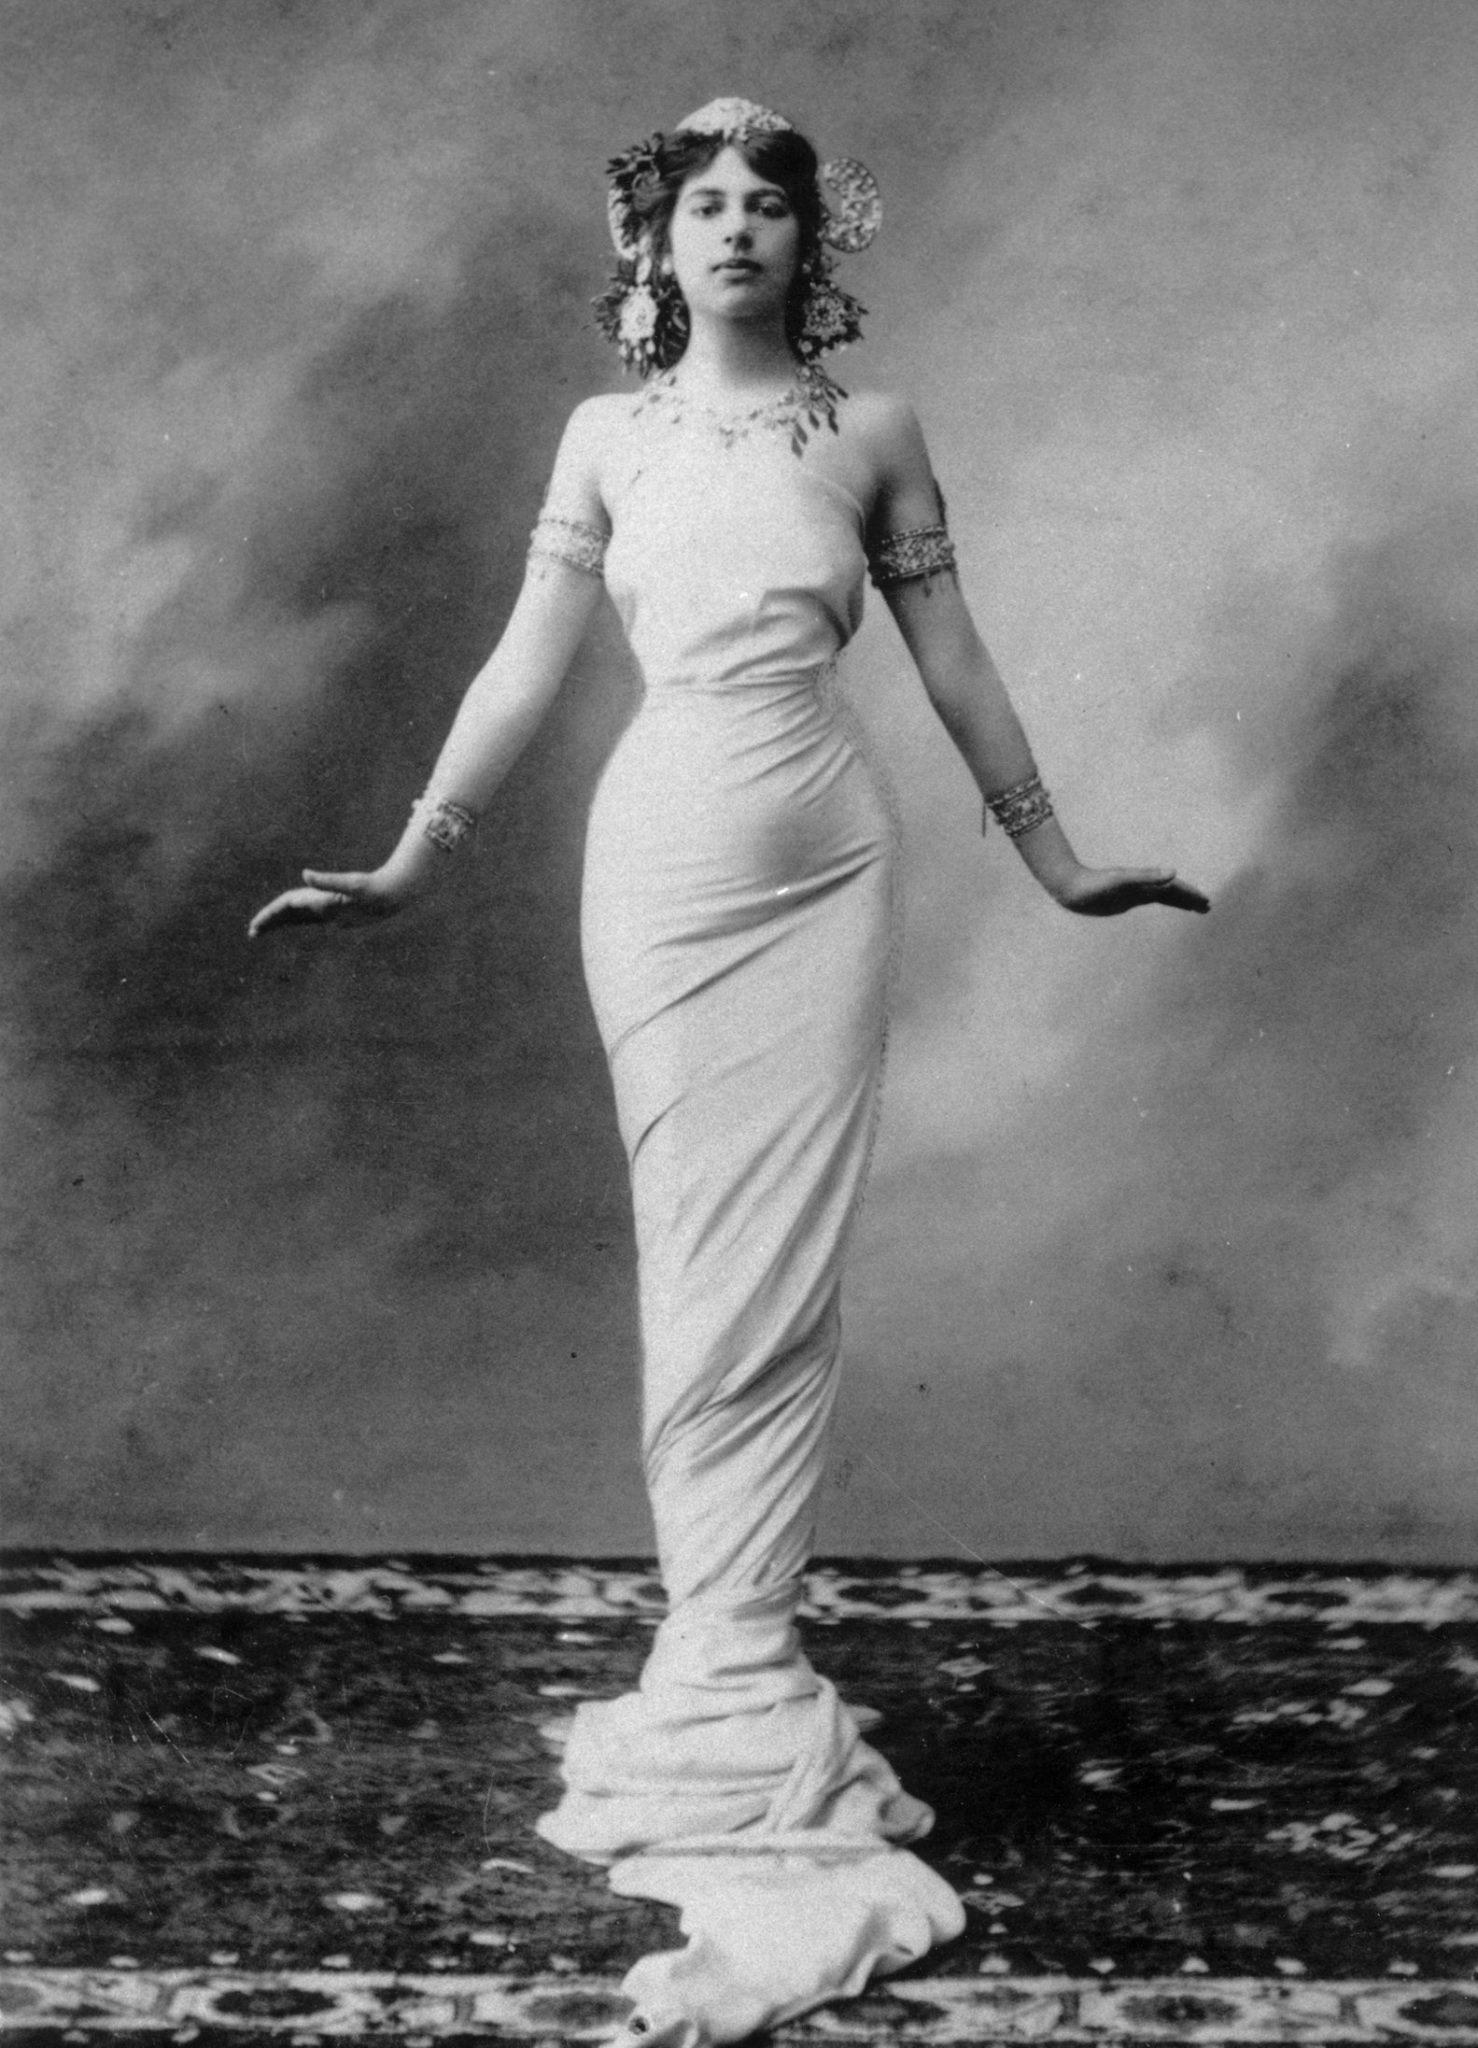 Chi era Mata Hari